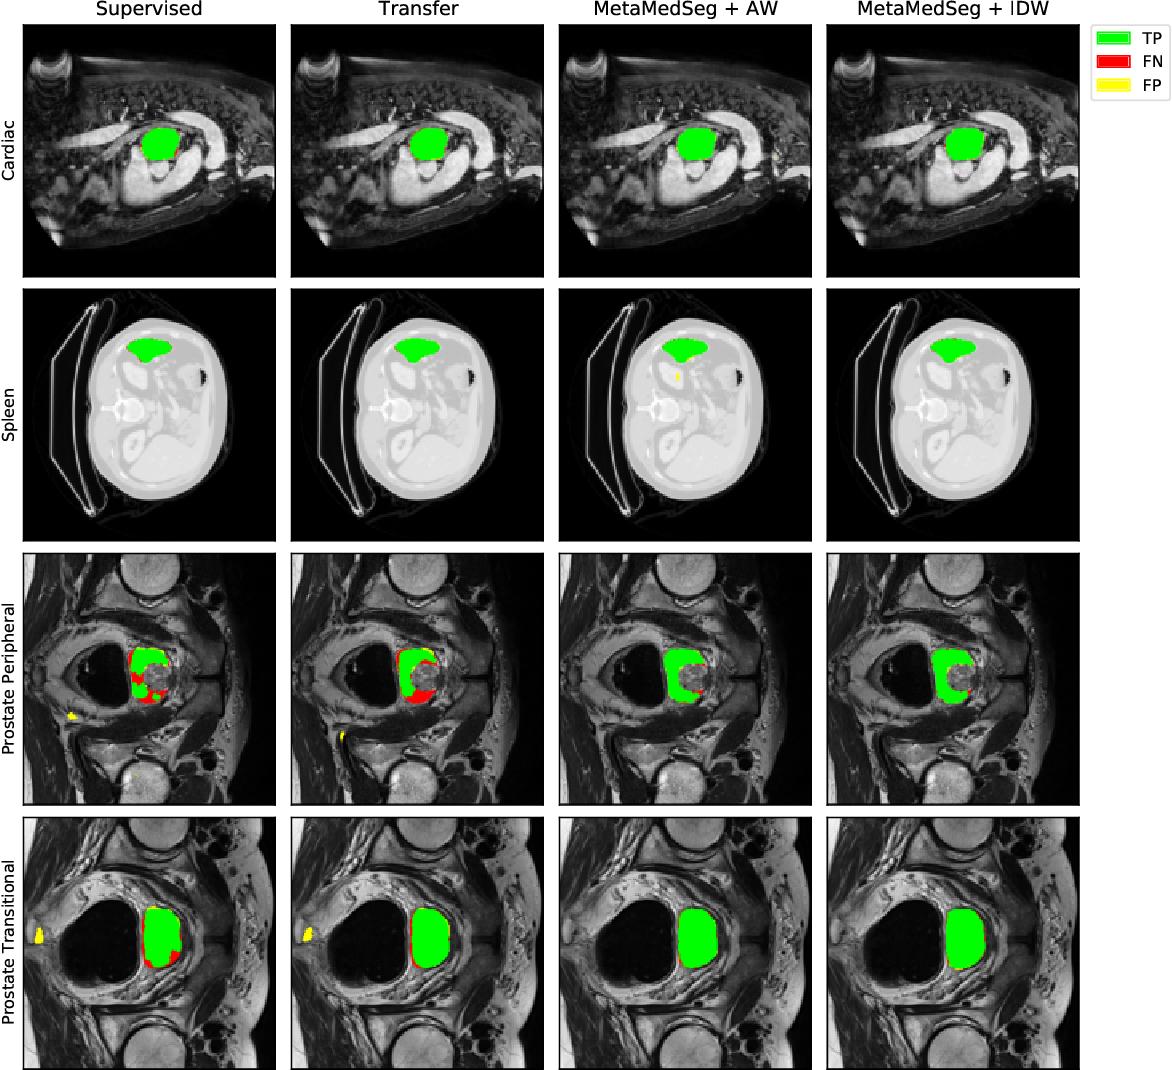 Figure 4 for MetaMedSeg: Volumetric Meta-learning for Few-Shot Organ Segmentation